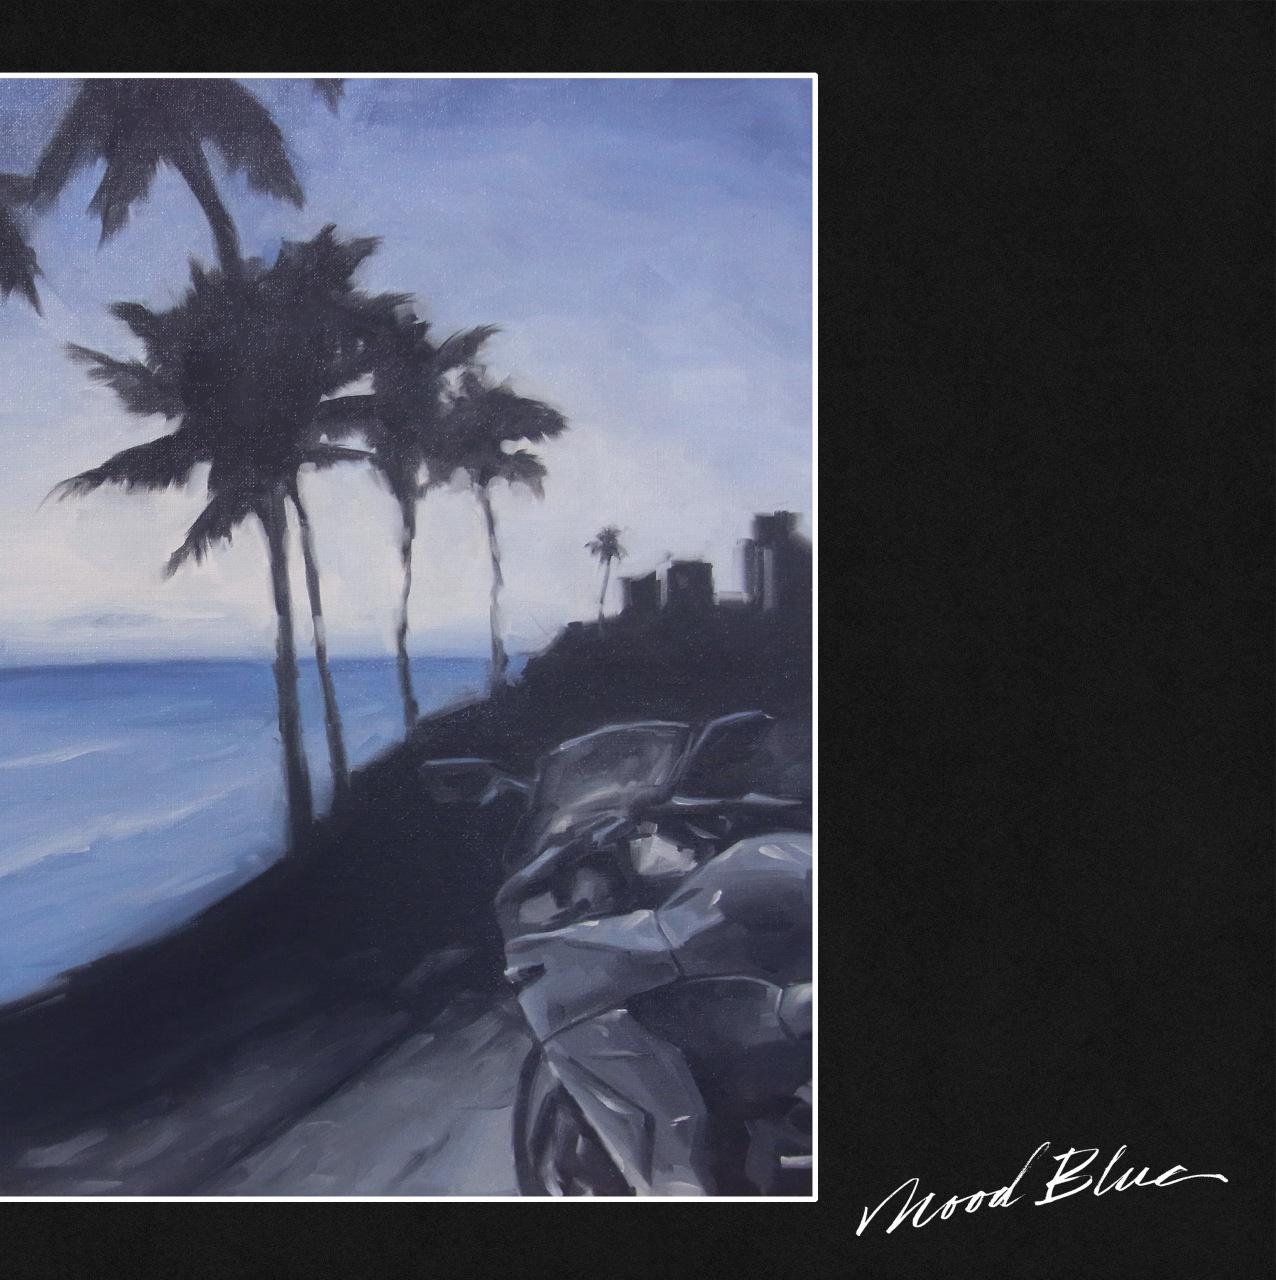 IOの2ndアルバム『Mood Blue』のリリースを記念して、期間限定ポップアップ・ストアが登場